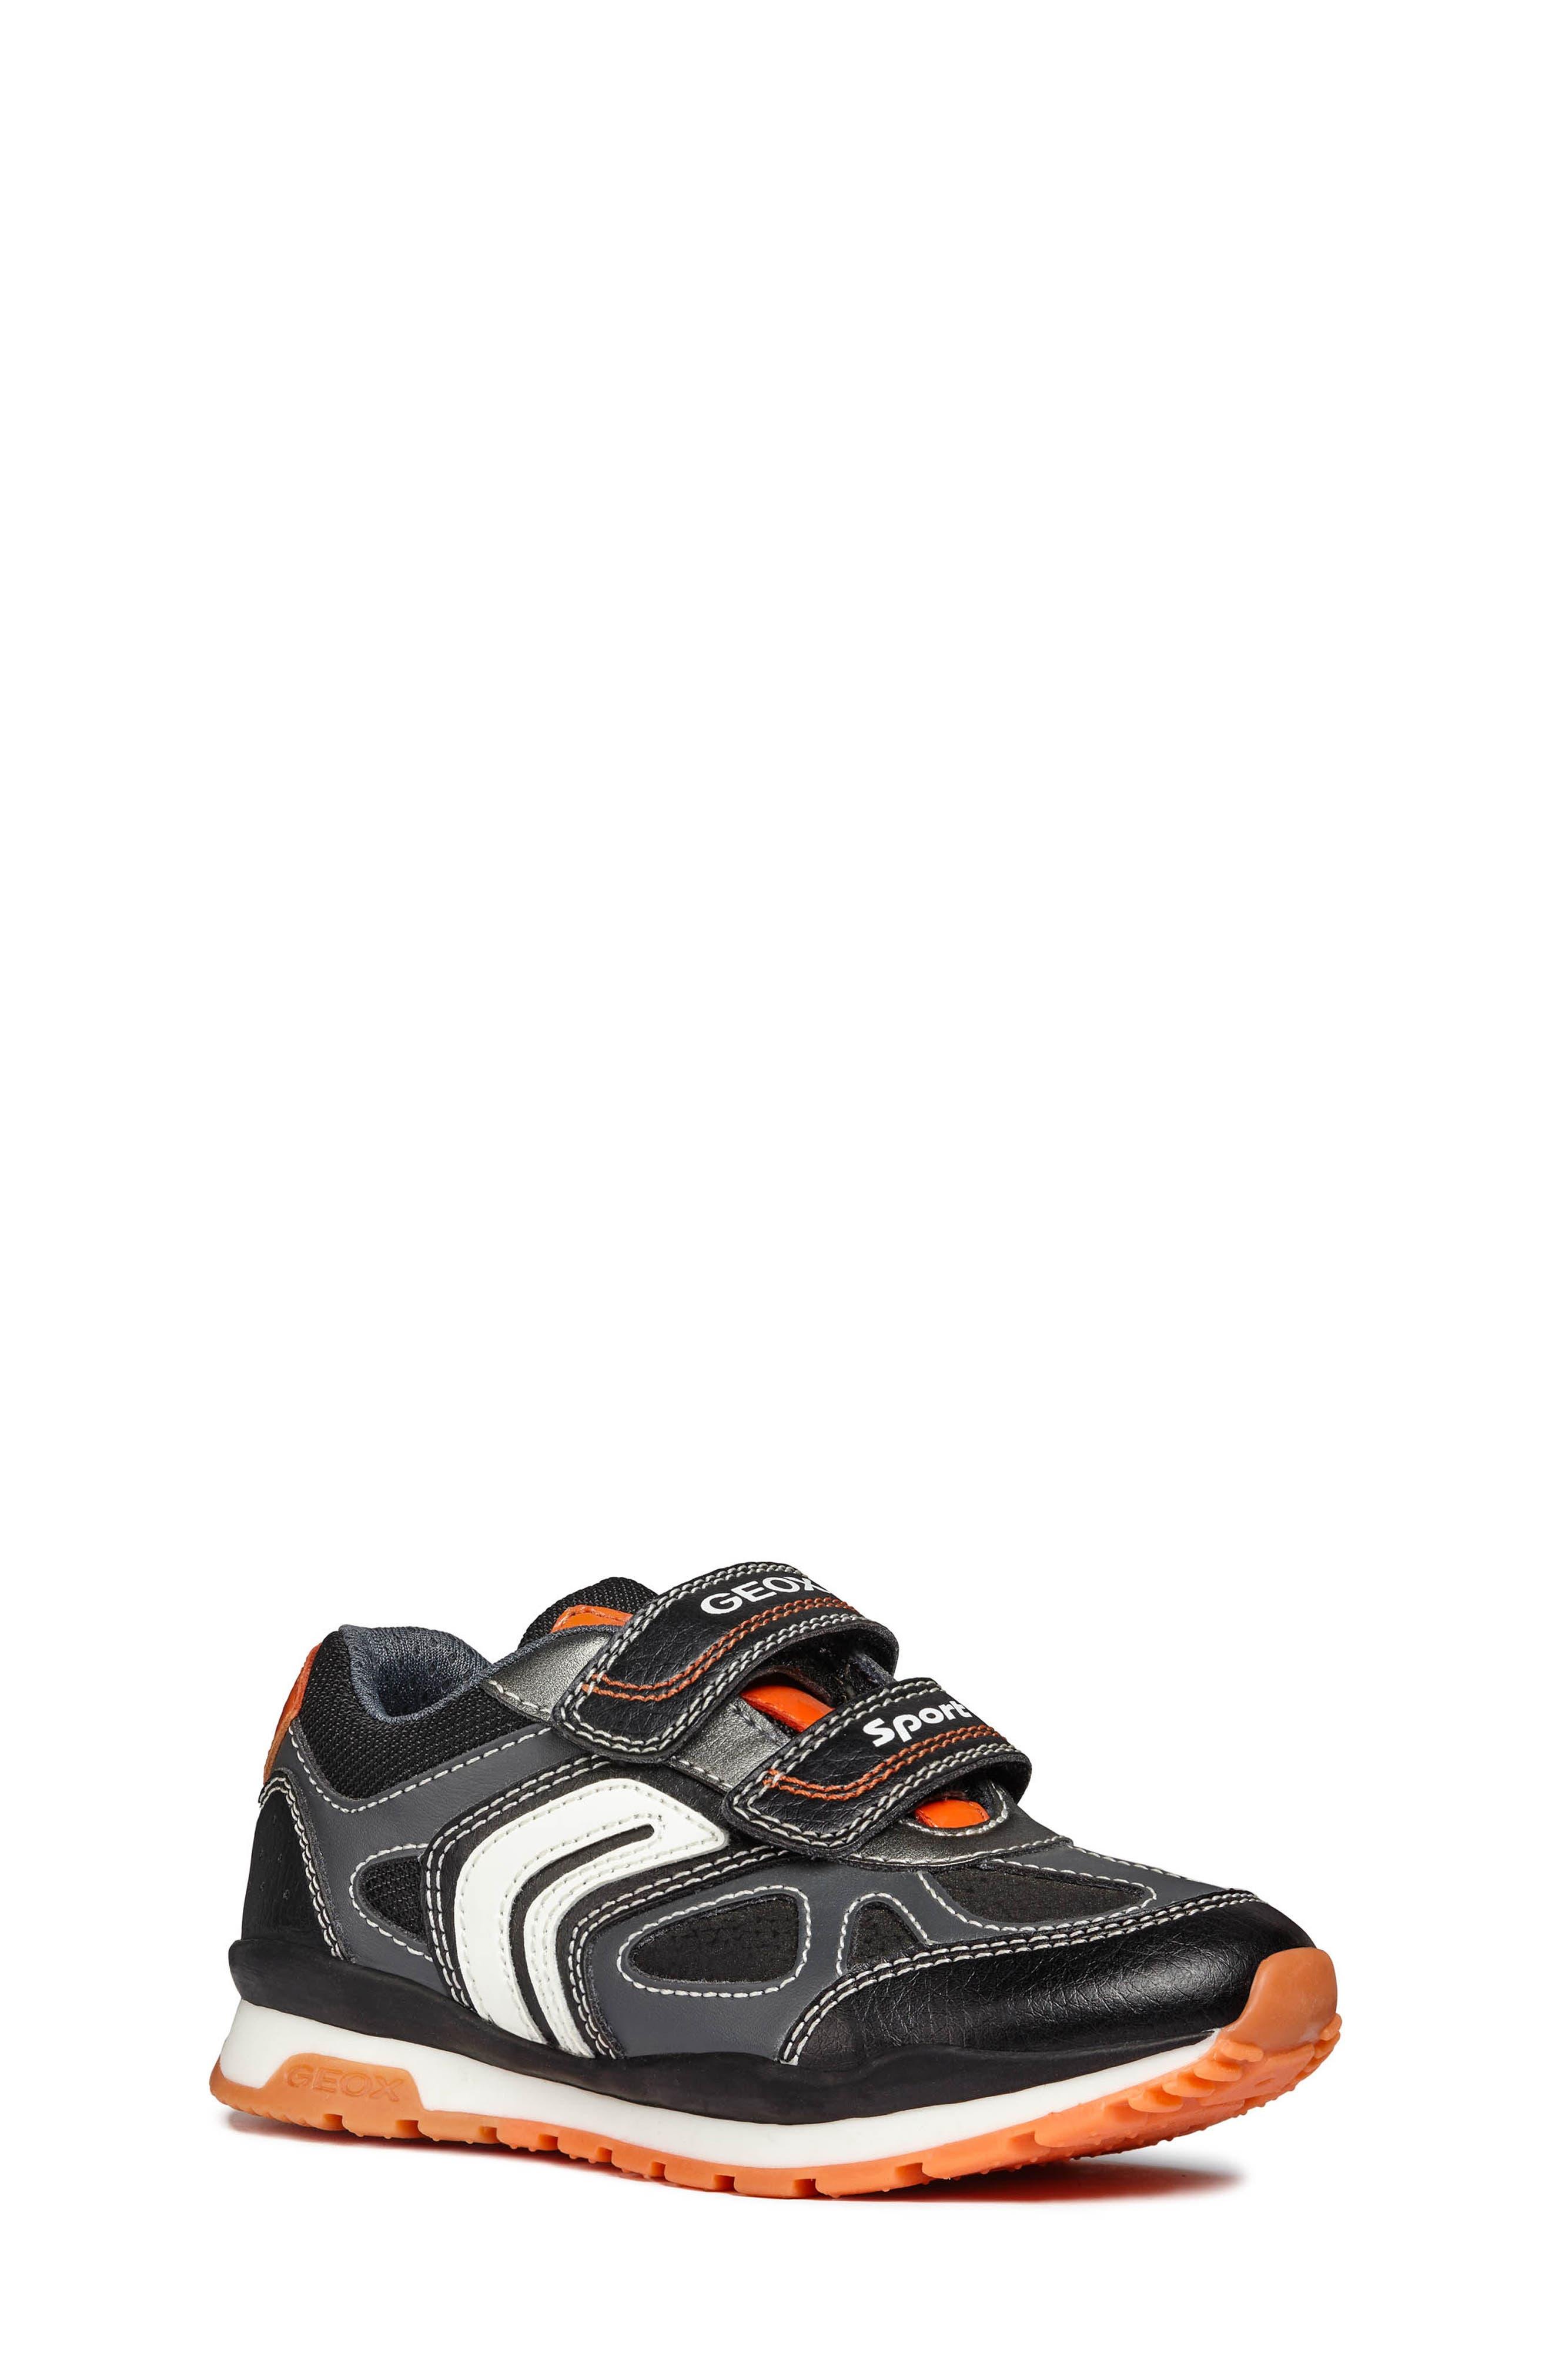 Pavel Sneaker,                             Main thumbnail 1, color,                             DARK GREY/ORANGE